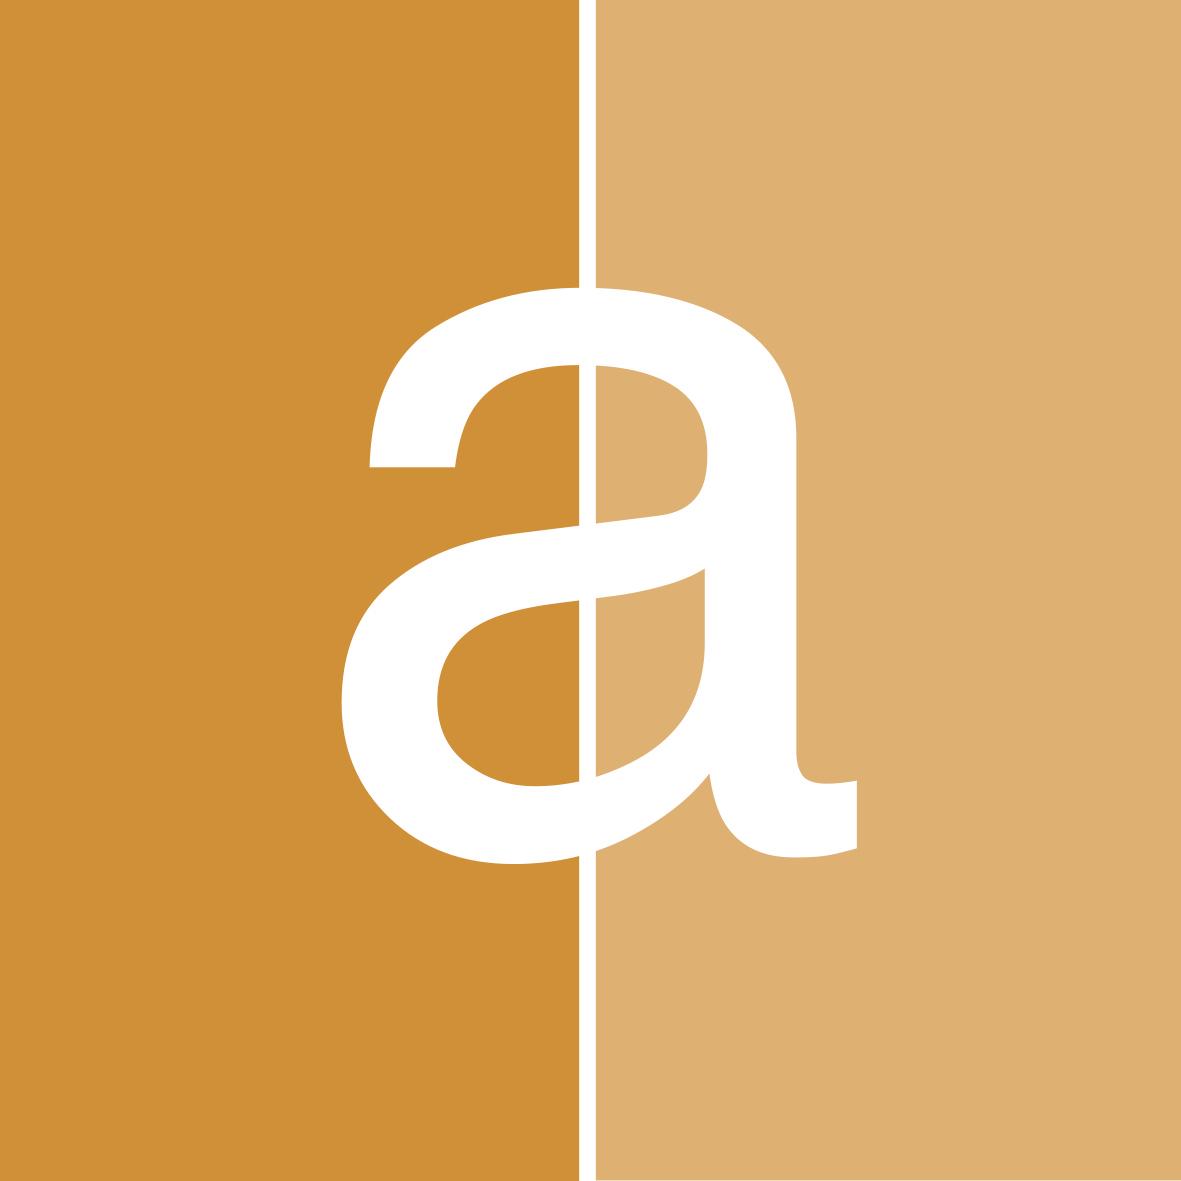 Alternativen zur klassizistischen Helvetica